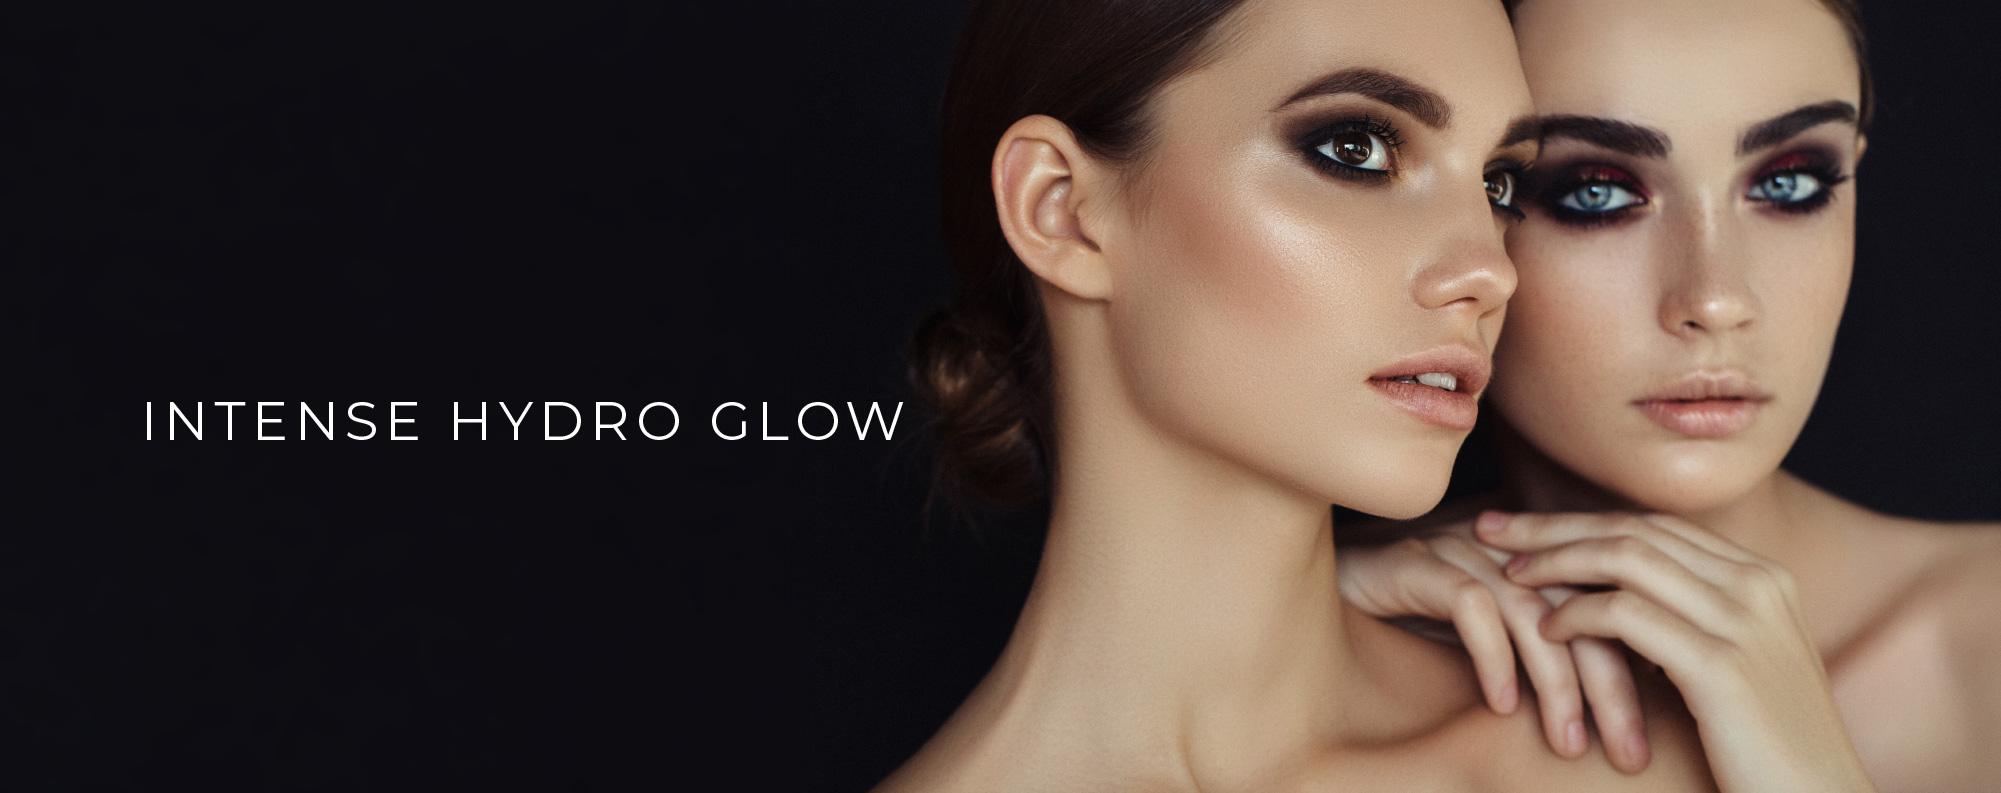 Intense Hydro Glow